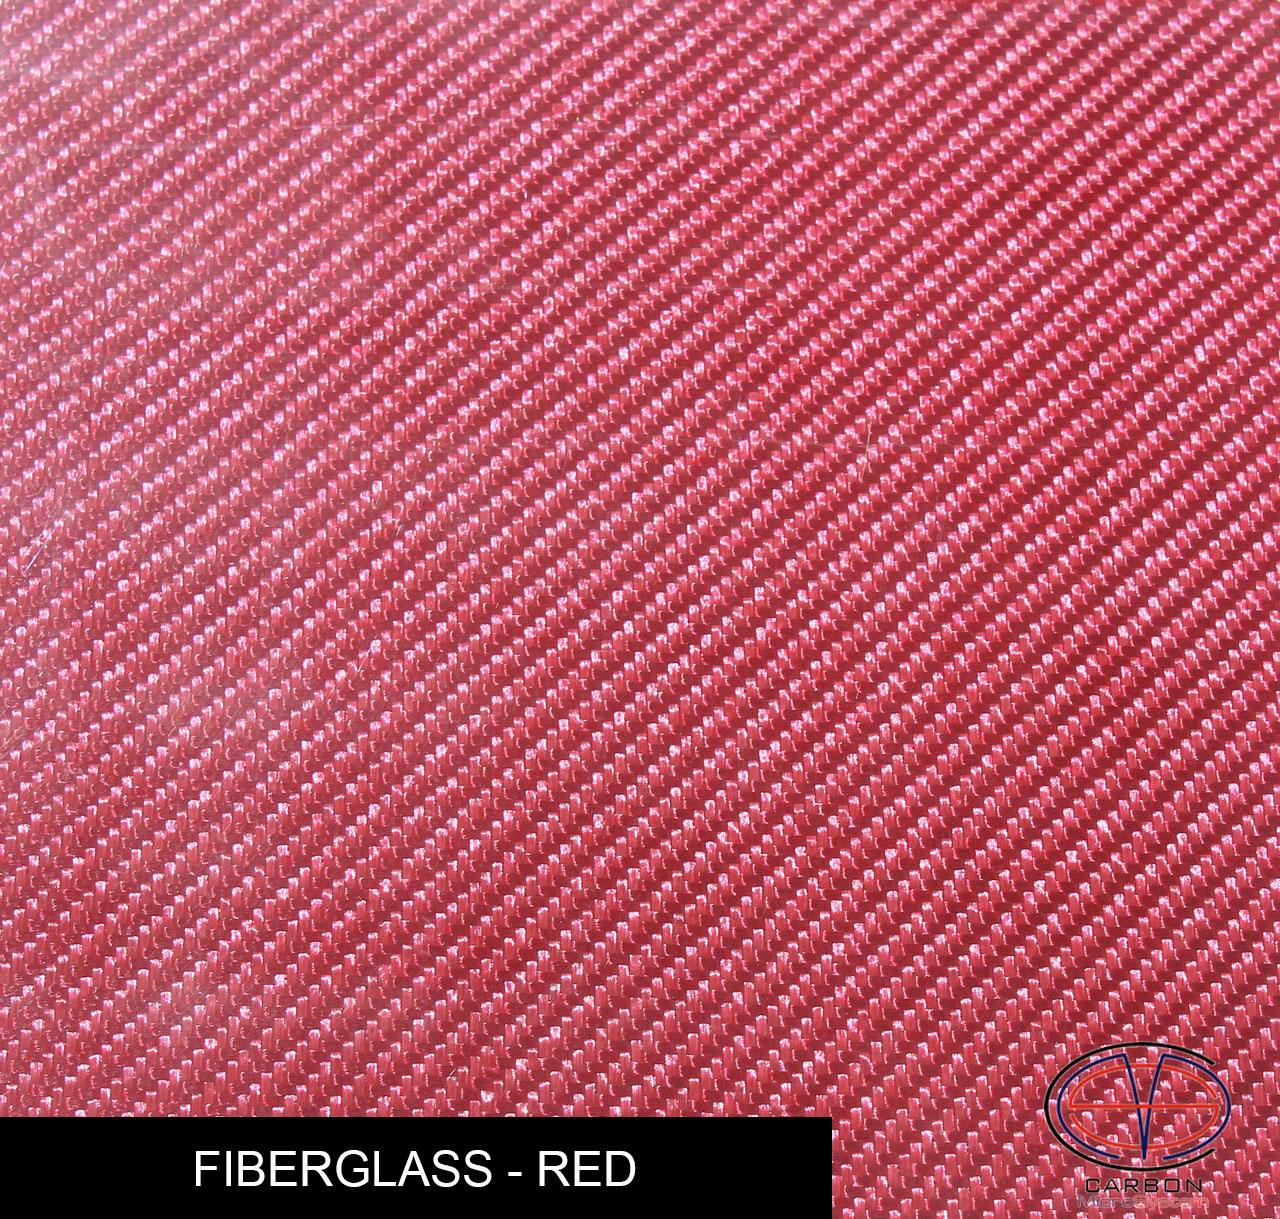 fiberglass red